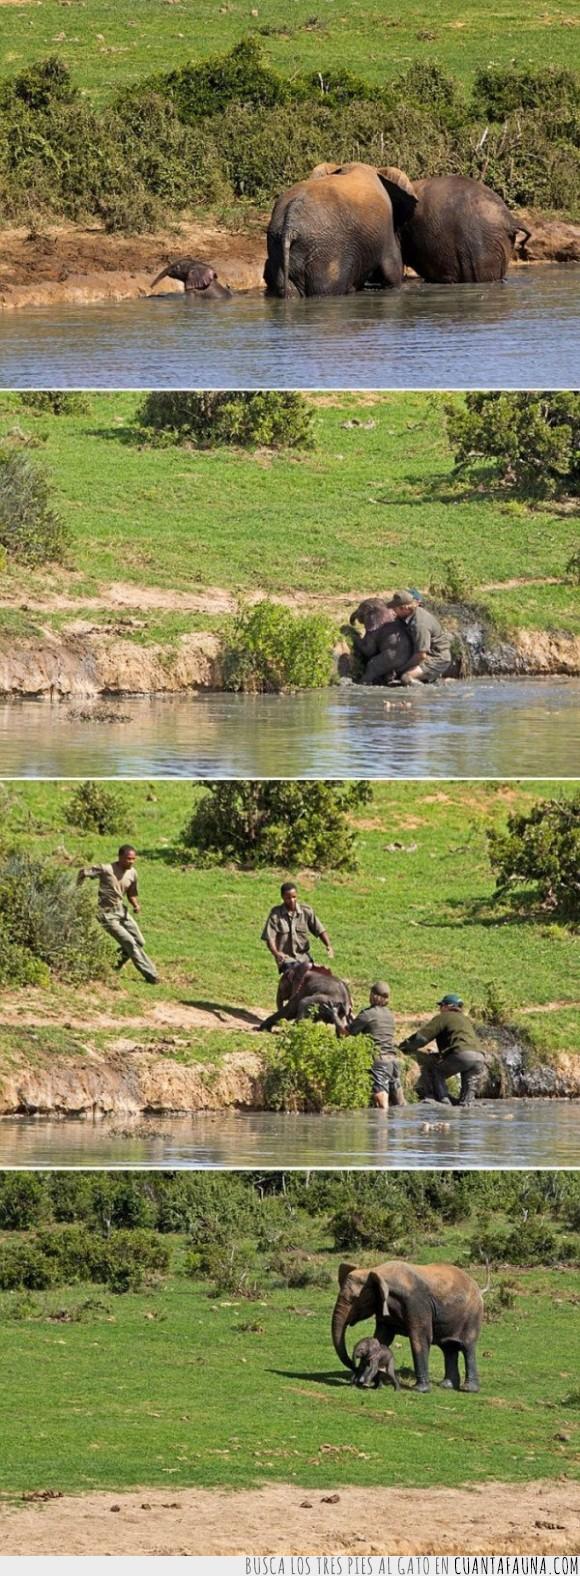 agua,ayudar,charca,dumbo,elefante,hijo,lago,madre,pequeño,sacar,salir